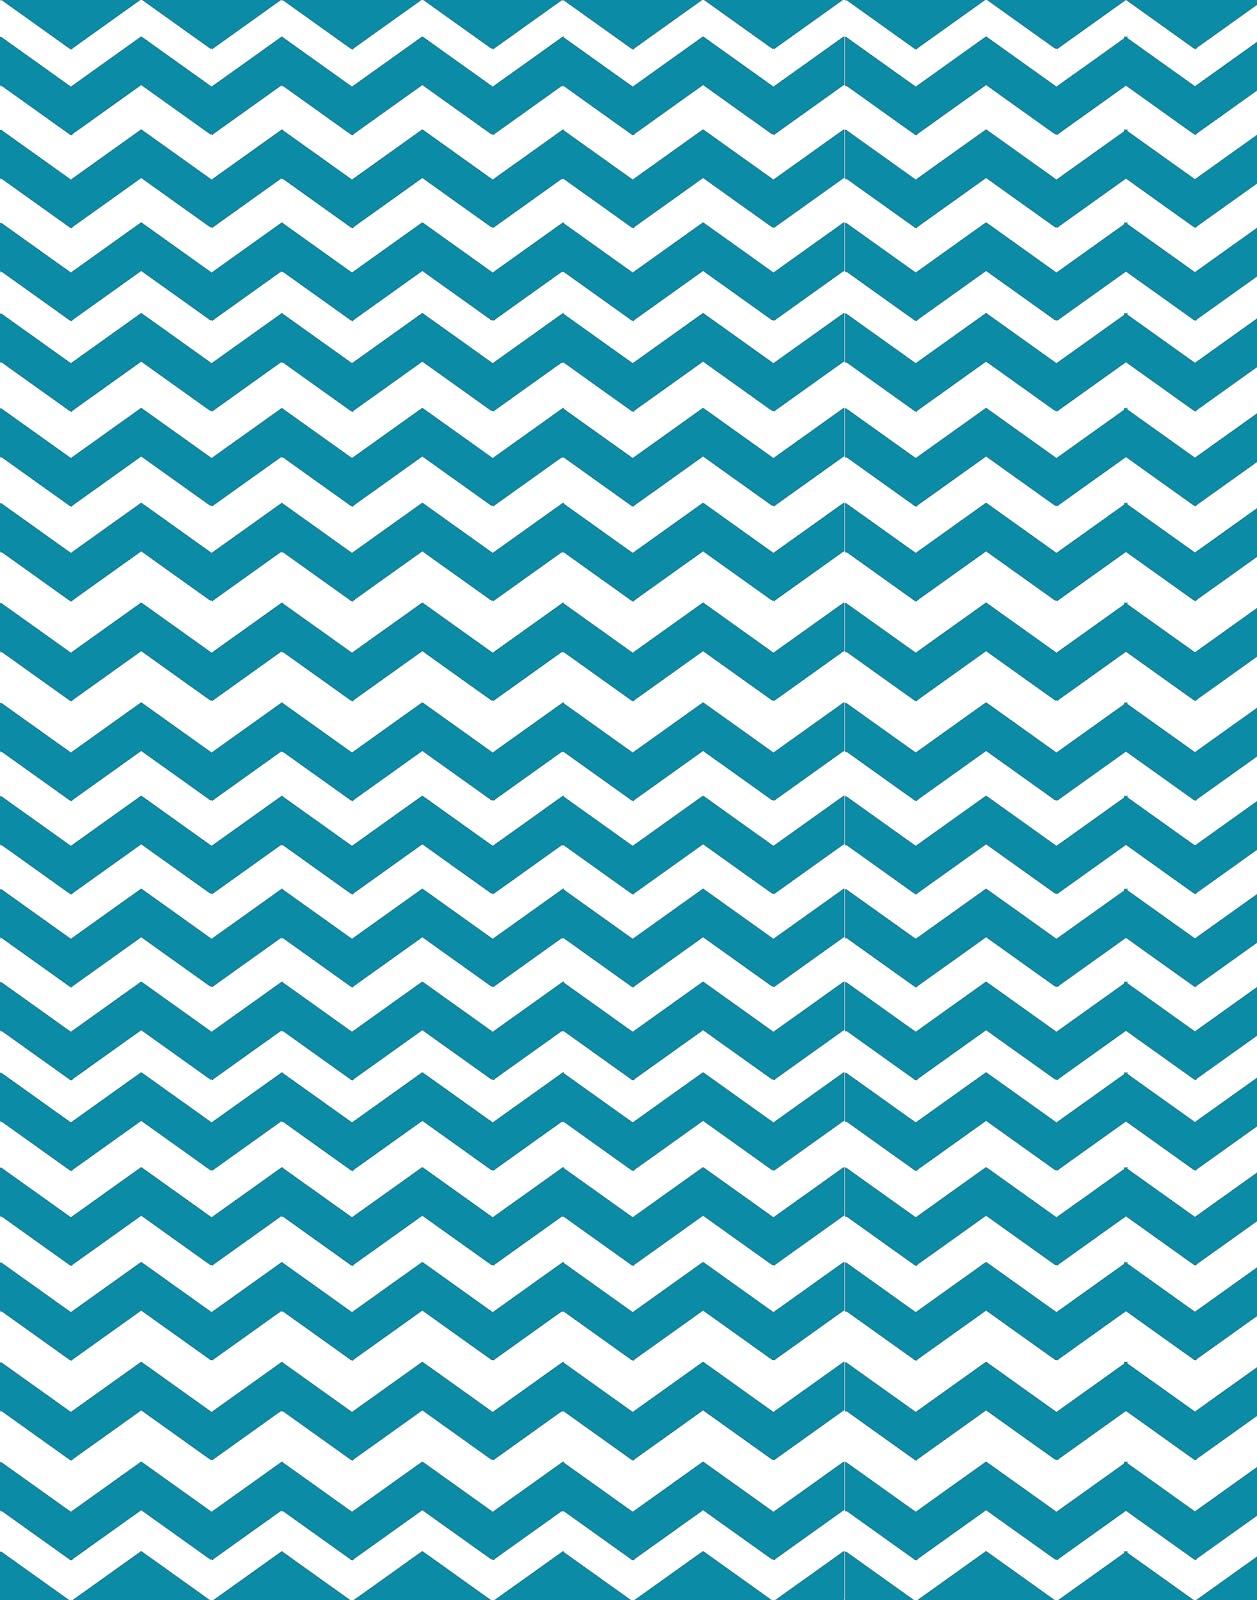 Chevron wallpaper for walls 2017 2018 best cars reviews for Blue chevron wallpaper